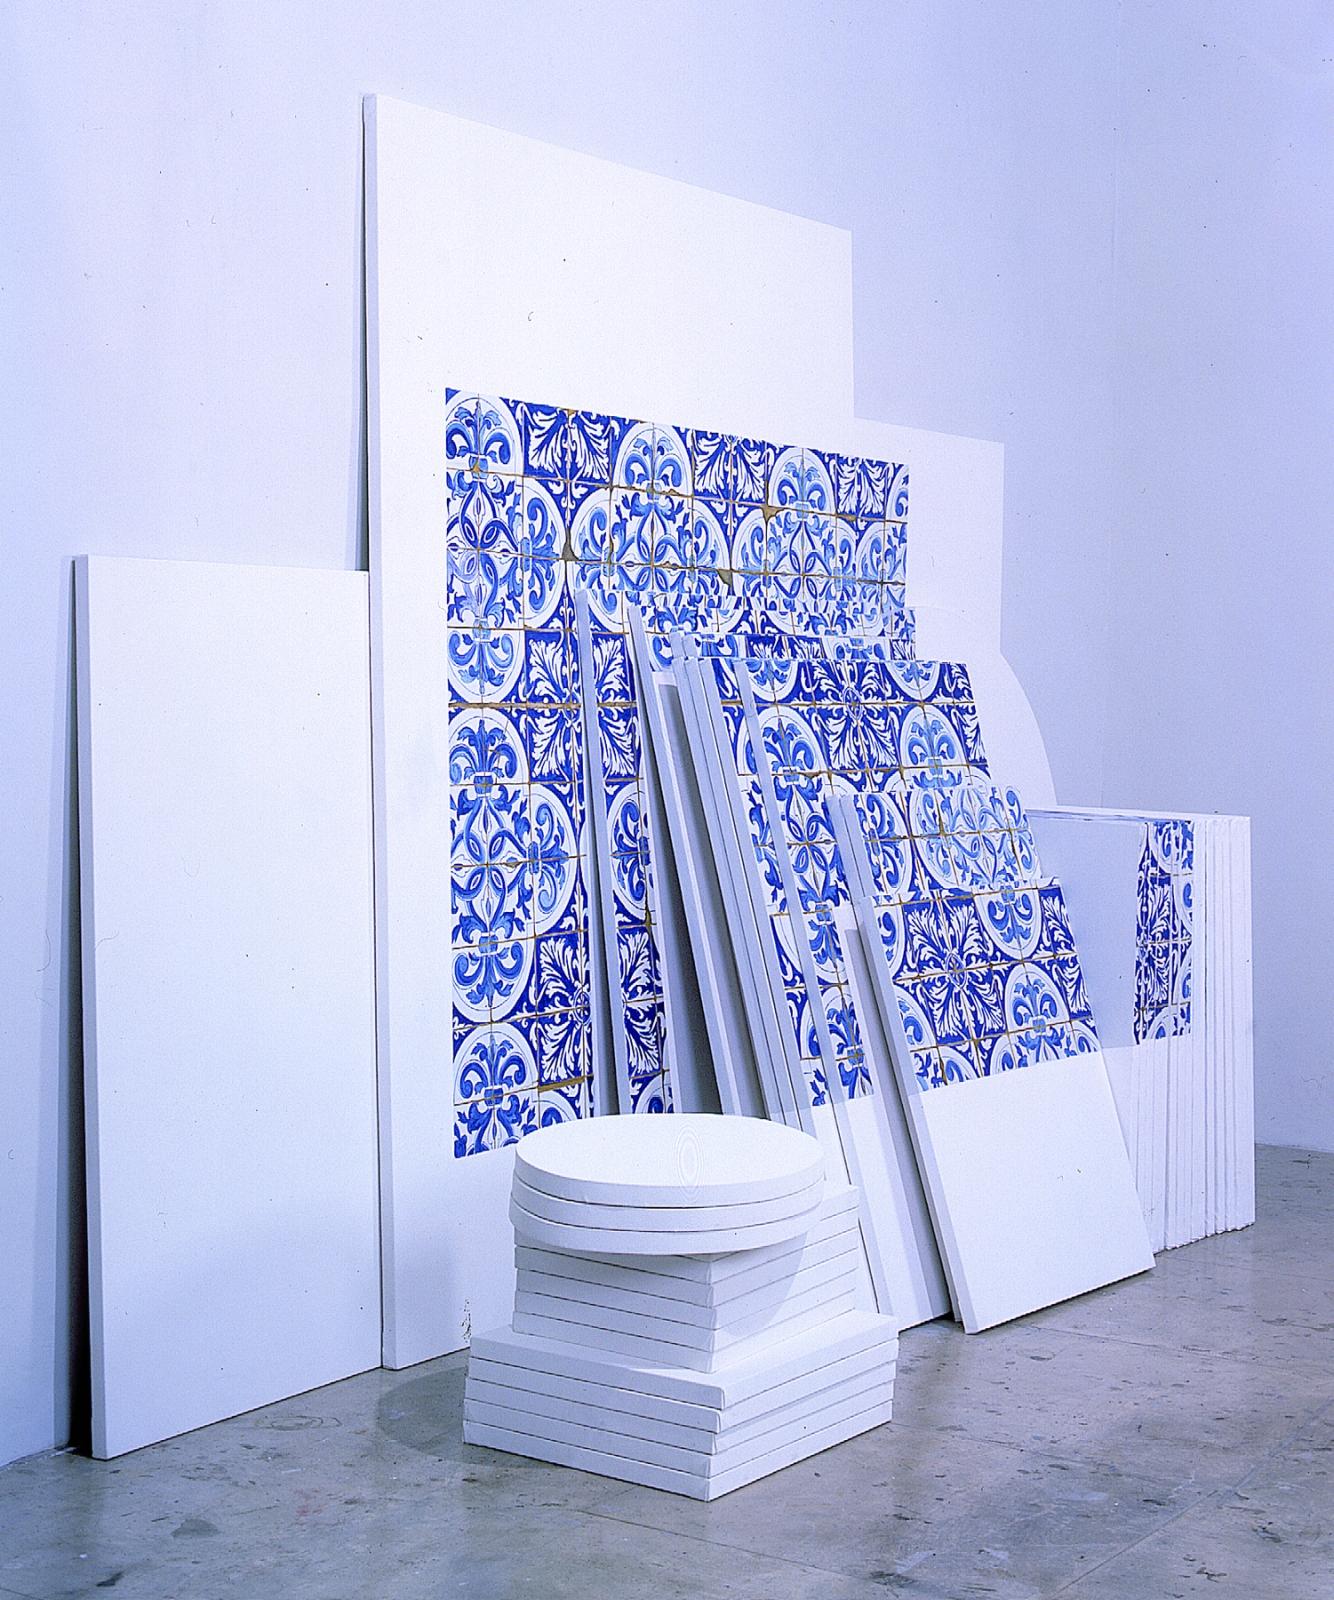 ADRIANA VAREJÃO, Azulejaria 'de Tapete' sobre Telas (Carpet-Style Tilework on Canvases), 1999